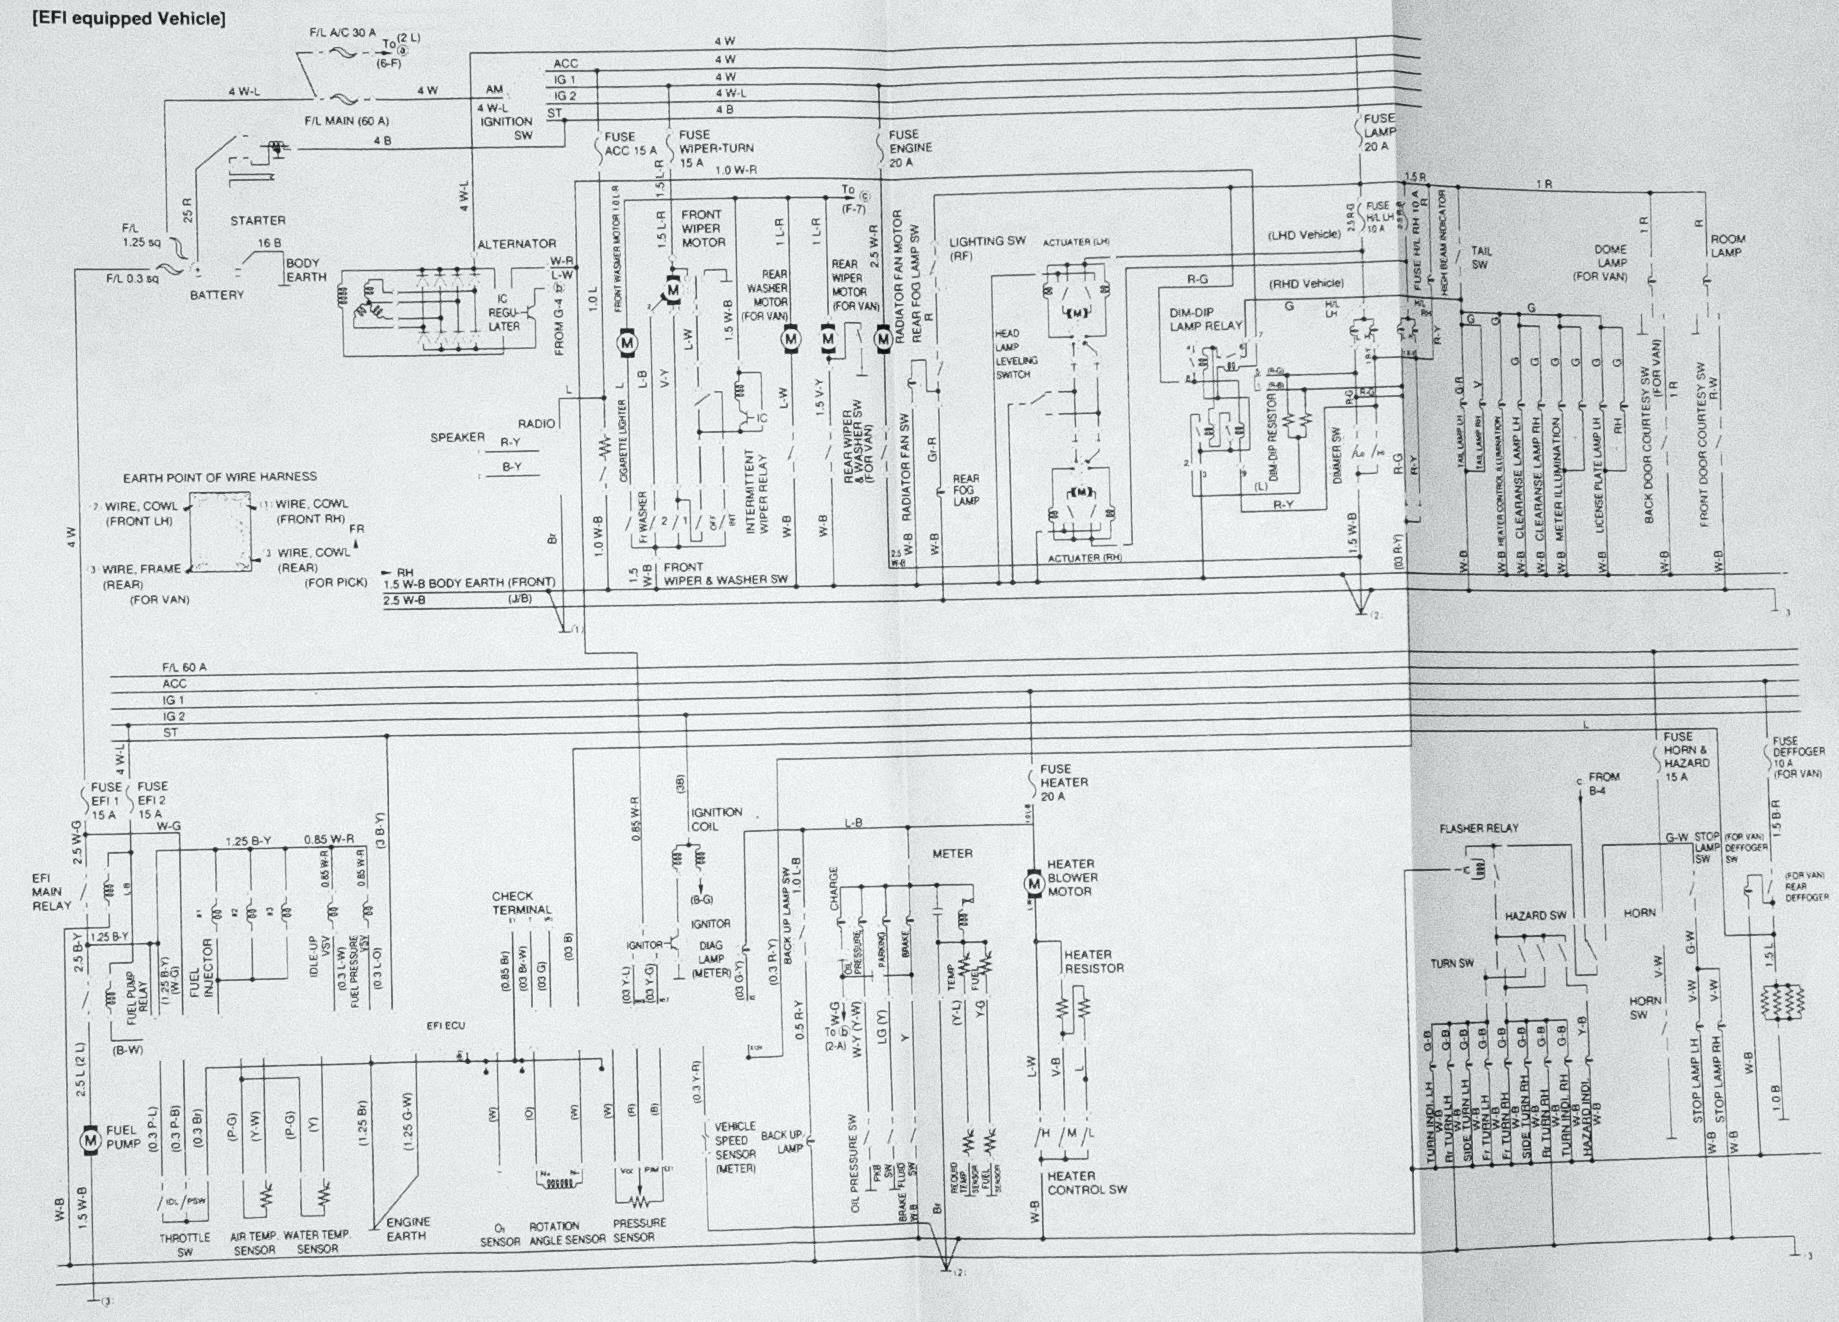 Wiring Diagram For Daihatsu Terios - Wiring Diagram Progresif on peterbilt steering diagram, peterbilt radio wiring harness, peterbilt headlight conversion, peterbilt body diagram, peterbilt battery diagram, peterbilt transmission diagram, peterbilt brake diagram, peterbilt relay diagram, peterbilt front axle diagram, peterbilt fuse, peterbilt circuit breaker, peterbilt starter wiring, peterbilt torque specs, peterbilt dash warning lights, peterbilt spec sheet, peterbilt switch, peterbilt ac diagram, peterbilt headlight wiring, peterbilt ignition wiring, peterbilt tachometer wiring,